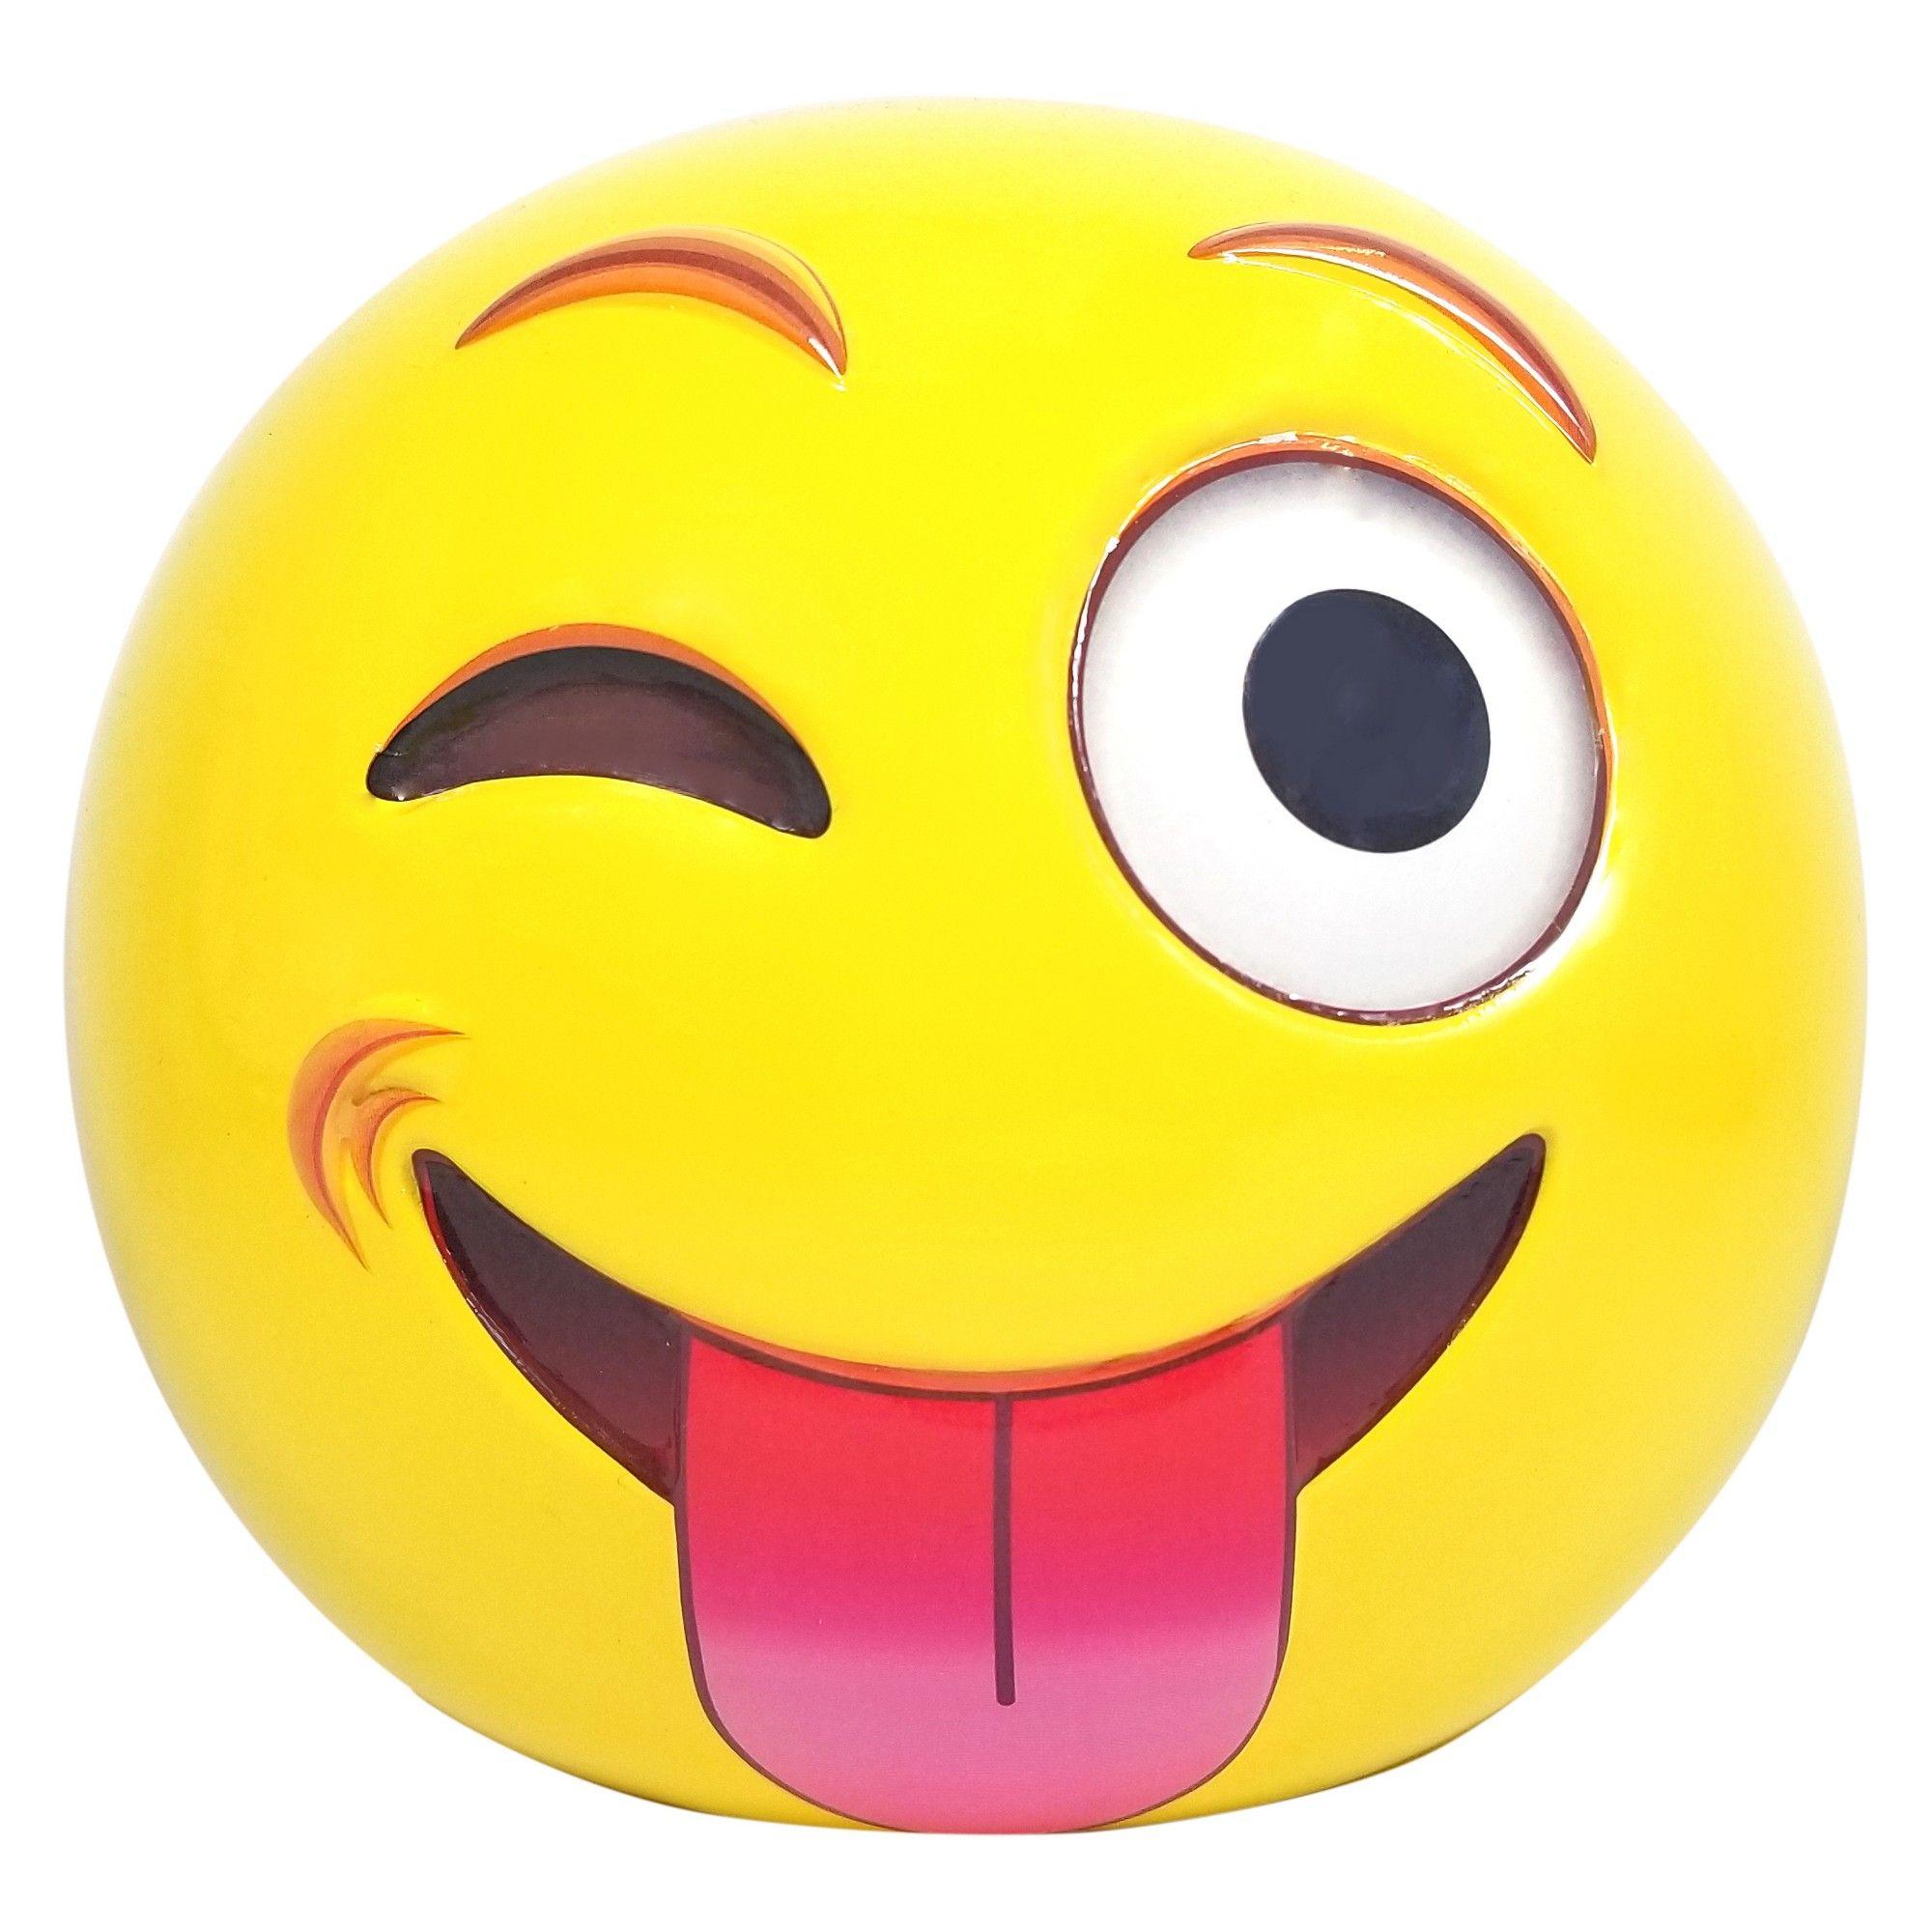 Emoji Express Yourself Coin Bank Yellow Black Red Yellow Emoji